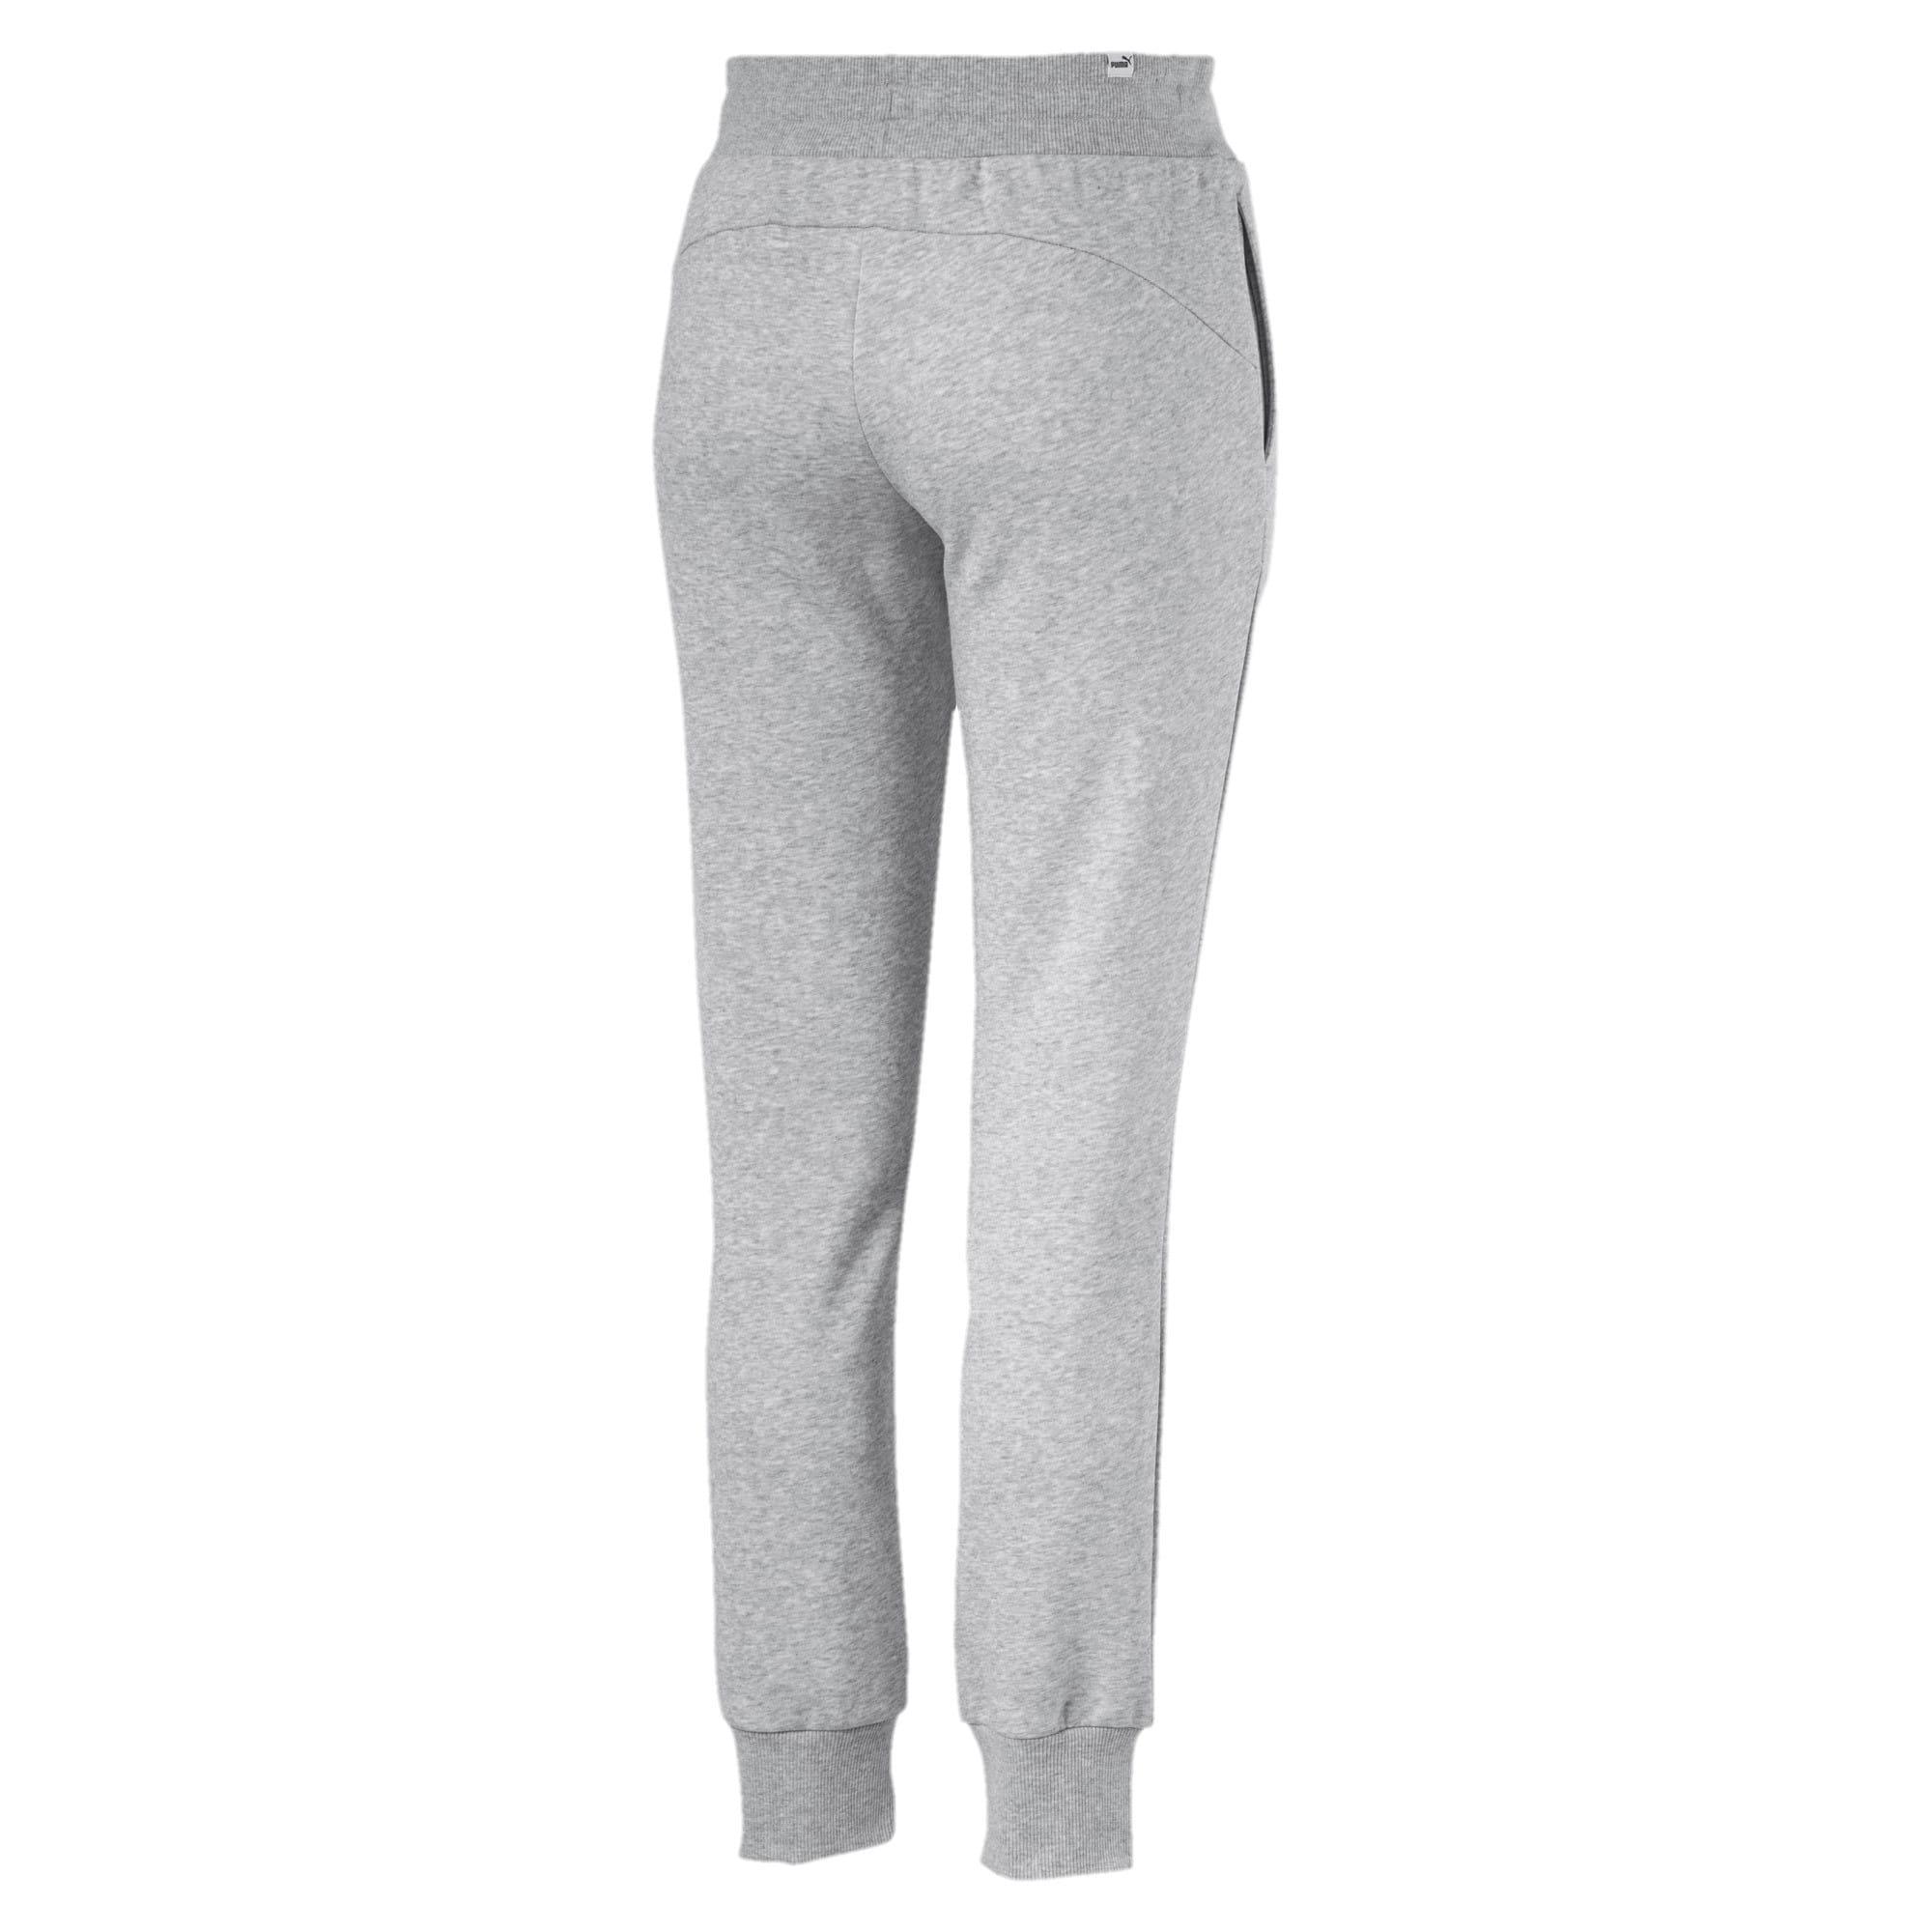 Thumbnail 5 of Essentials Fleece Women's Pants, Light Gray Heather, medium